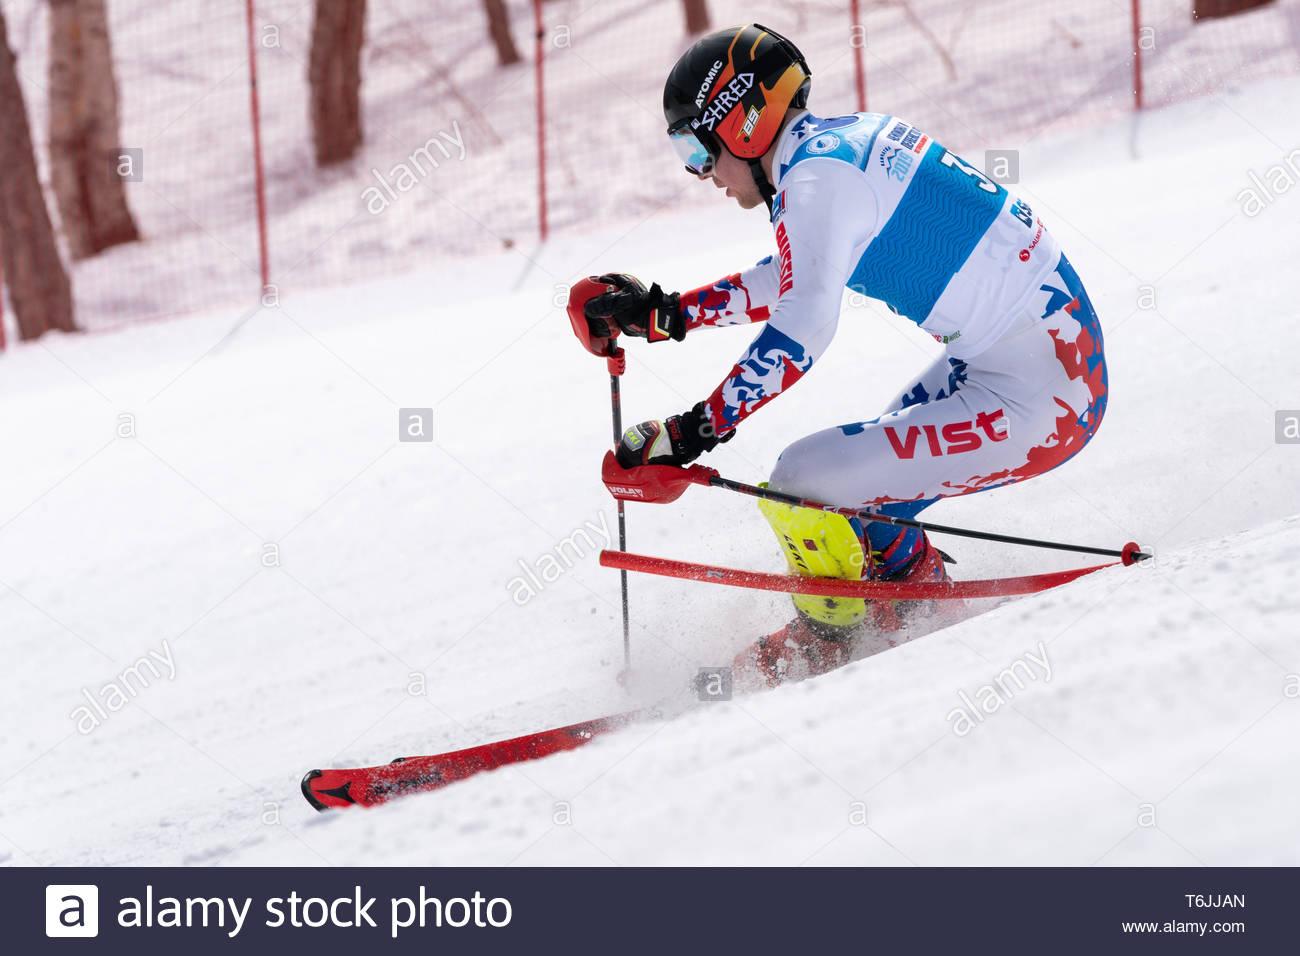 MOROZNAYA MOUNT, KAMCHATKA, RUSSIA - MAR 29, 2019: Russian Alpine Skiing Championship International Ski Federation Championship slalom. Mountain skier - Stock Image